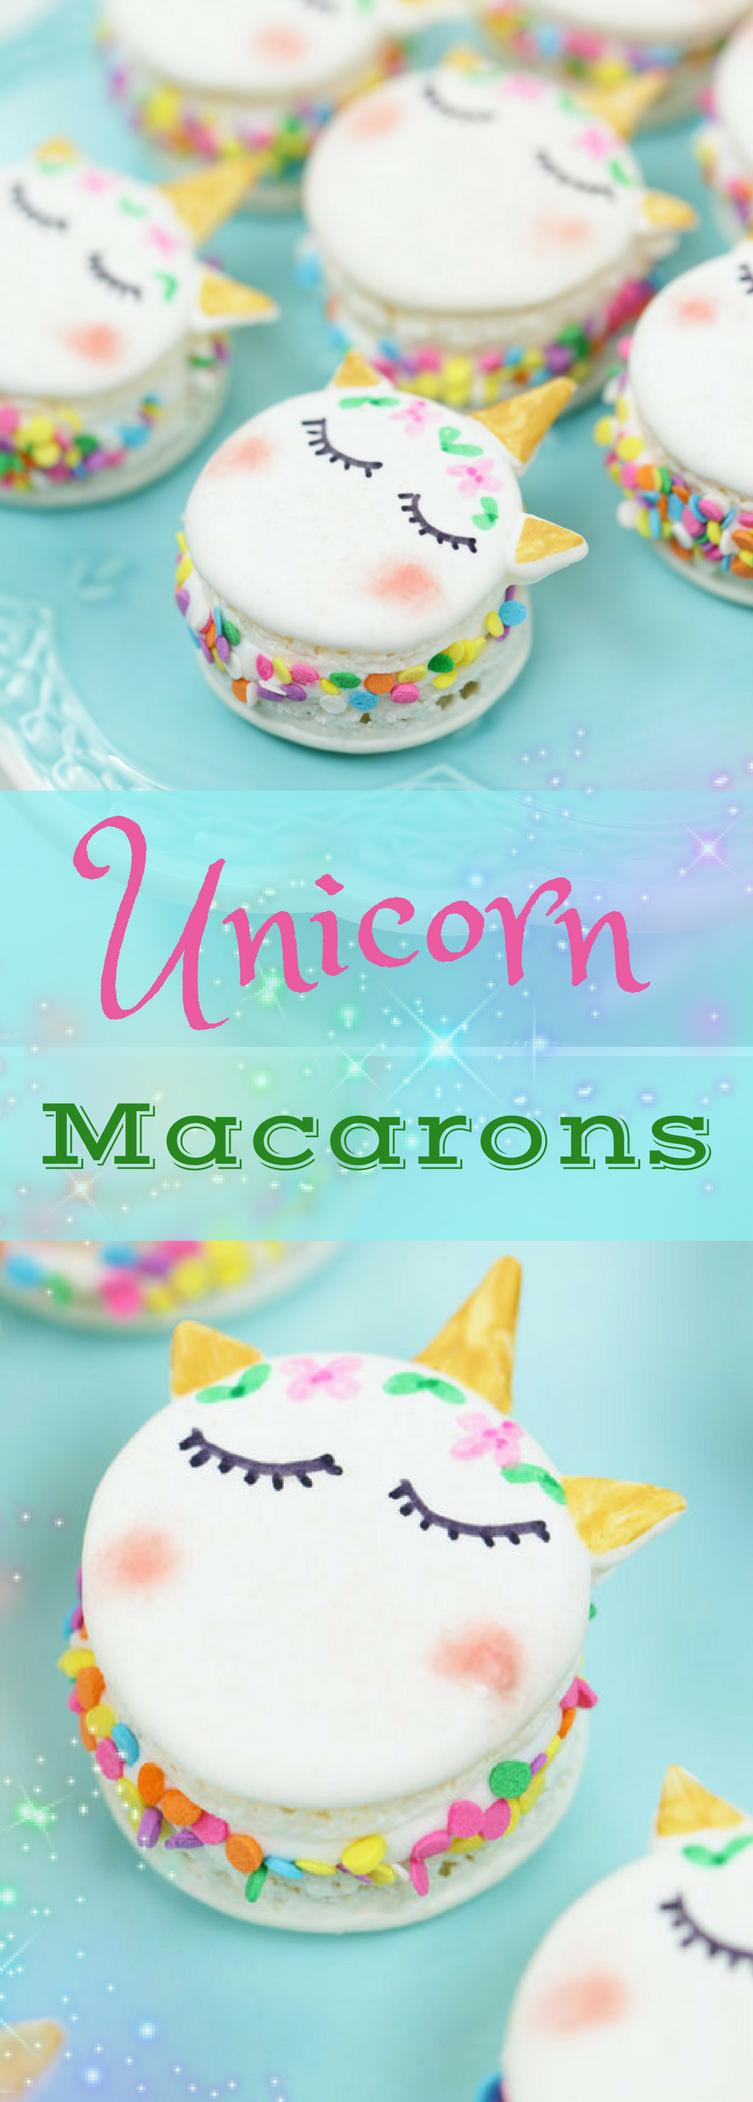 Unicorn Macaron Recipe